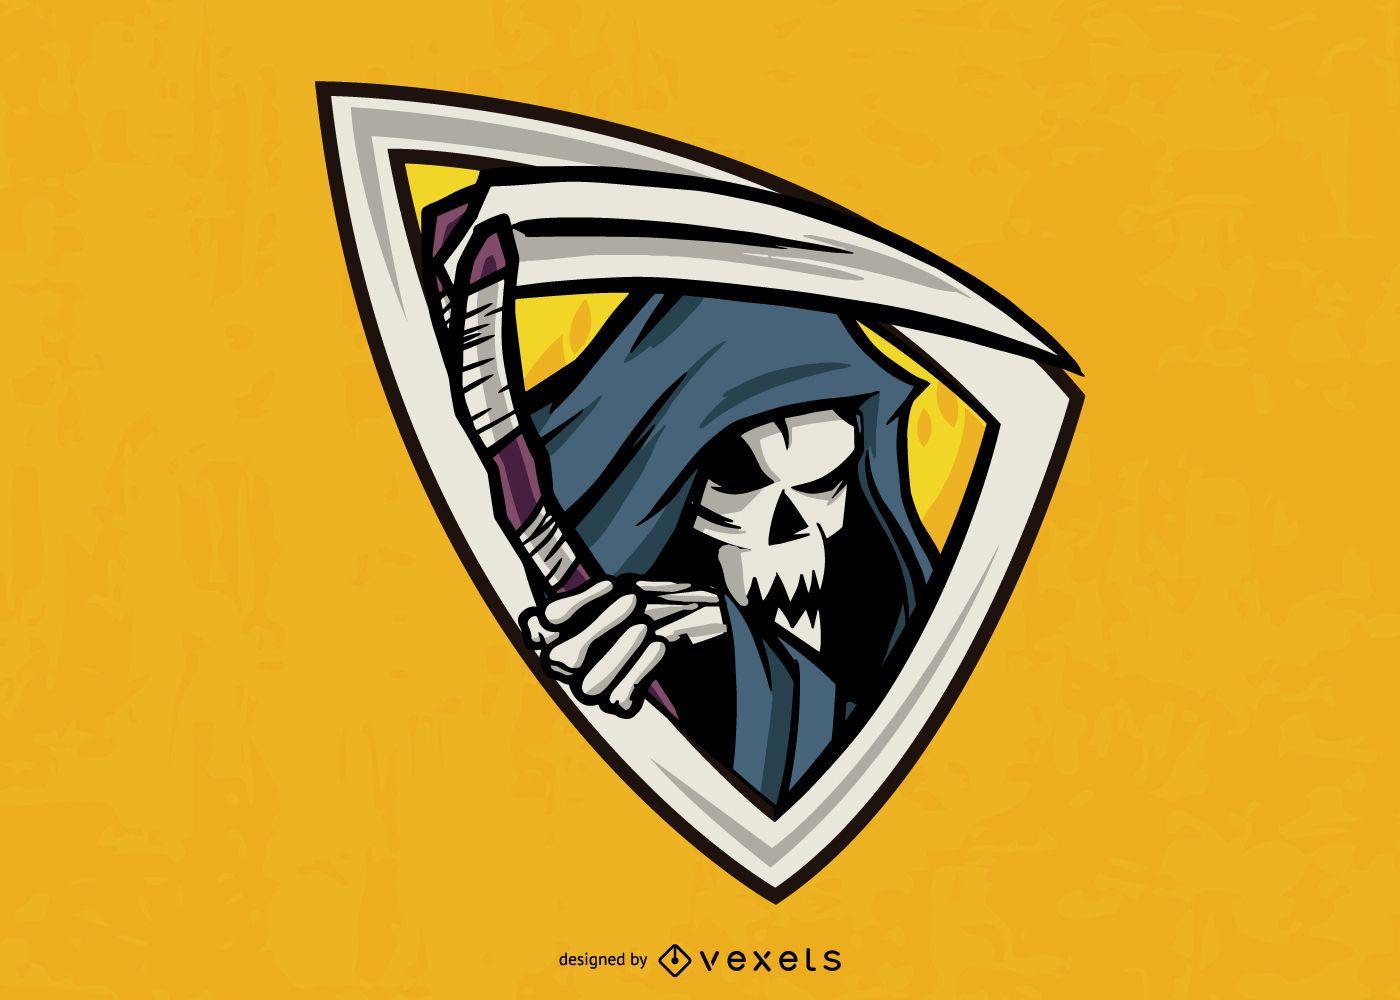 Grim reaper emblem illustration